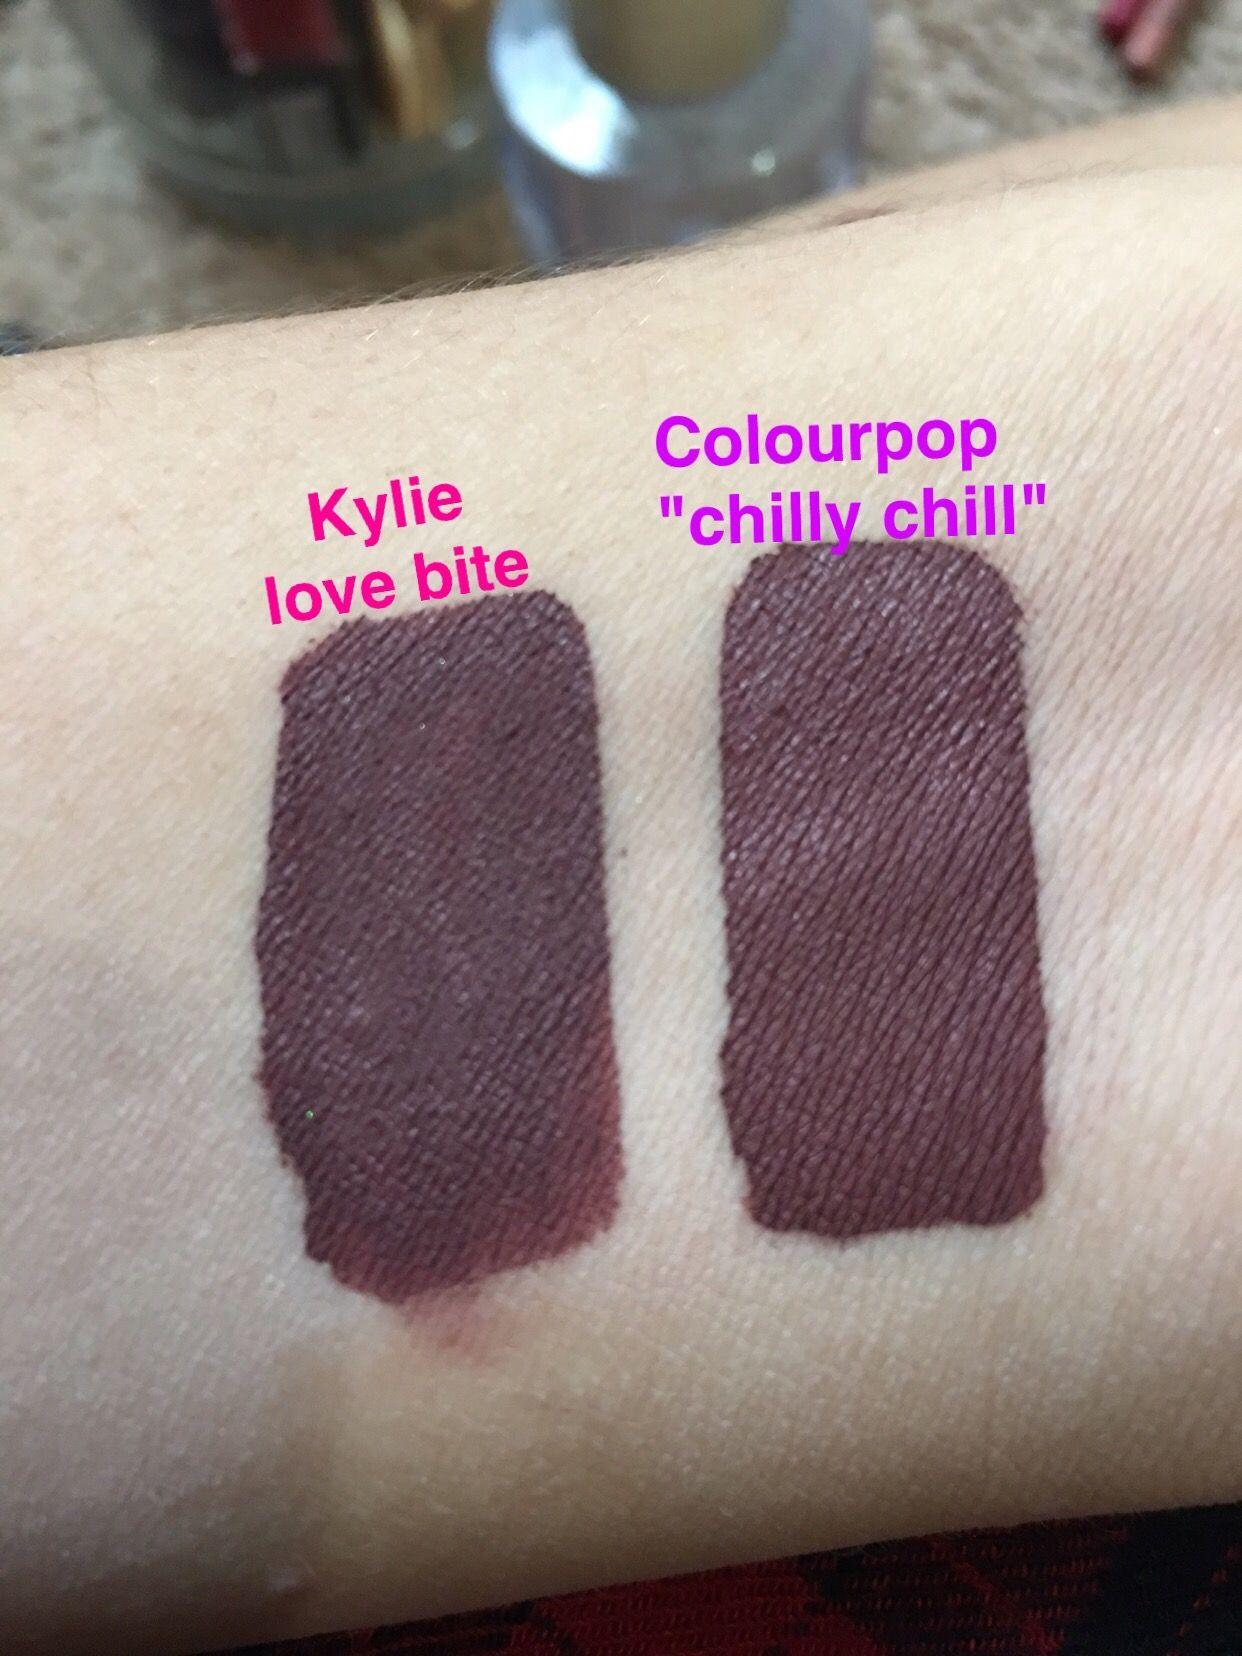 Colourpop Kylie Cosmetics: Kylie Love Bite, Colourpop Chilly Chill